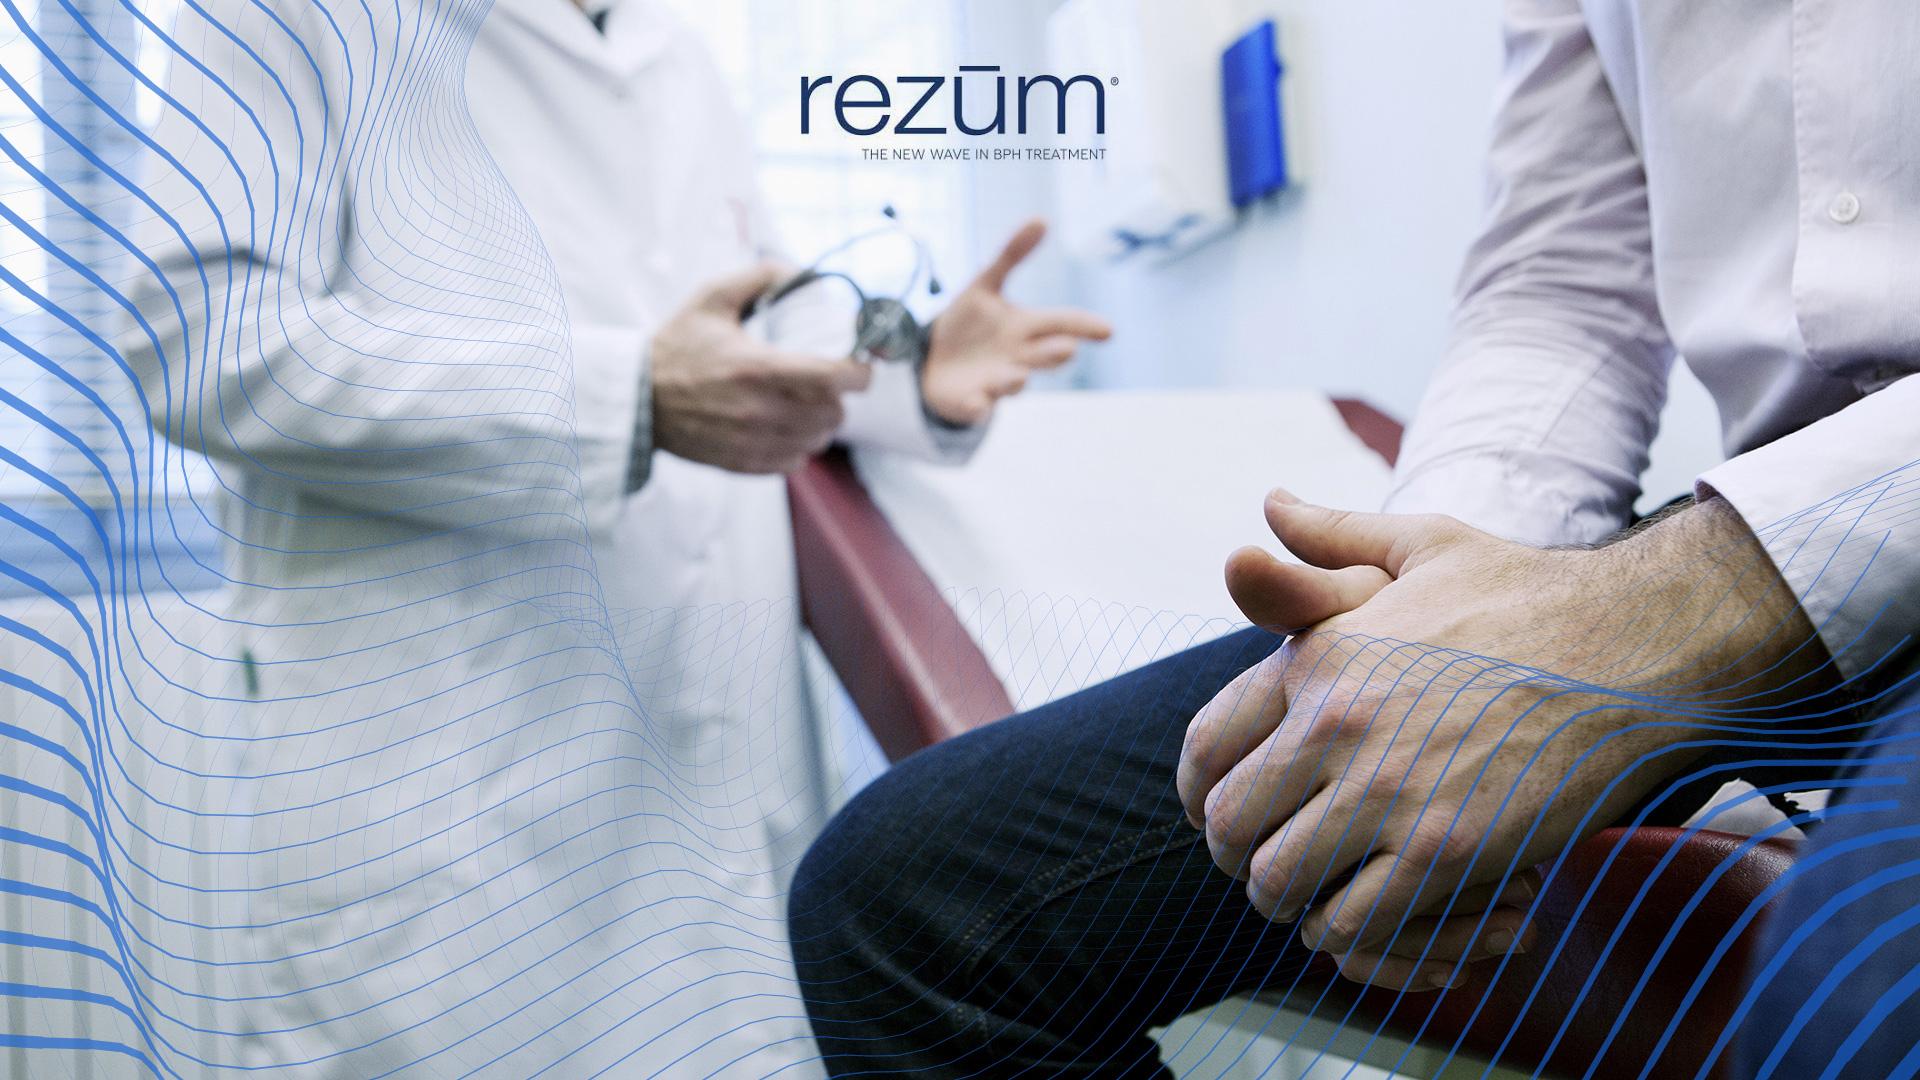 Are Urolift and Rezum treatments long-lasting?